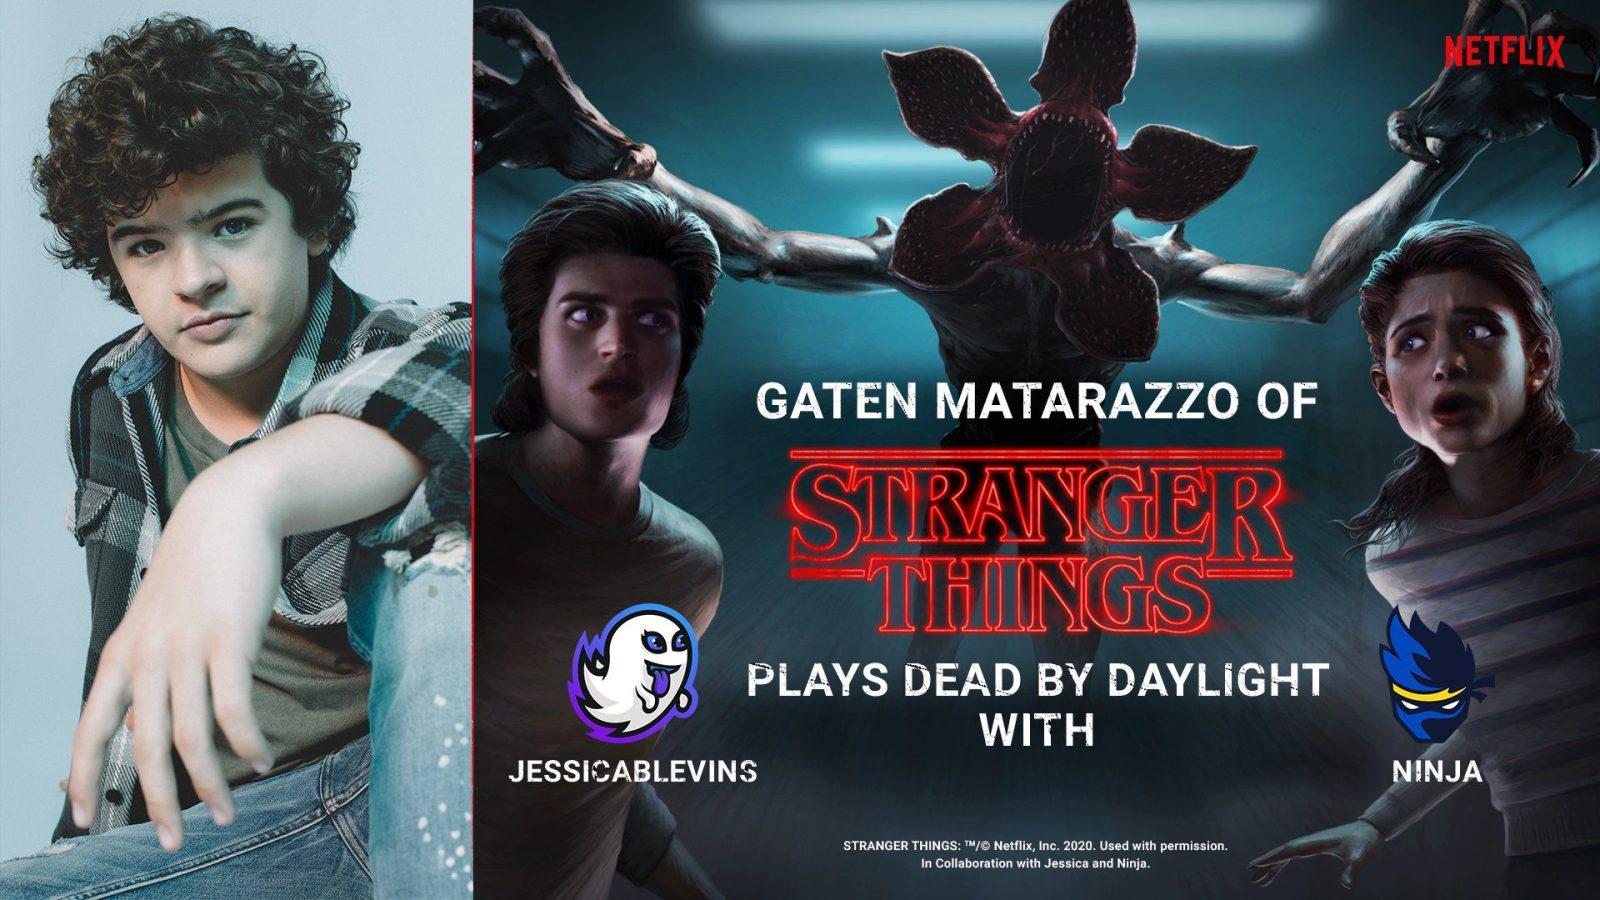 Ninja and Stranger Things star Gaten Matarazzo will team up to play Dead by Daylight